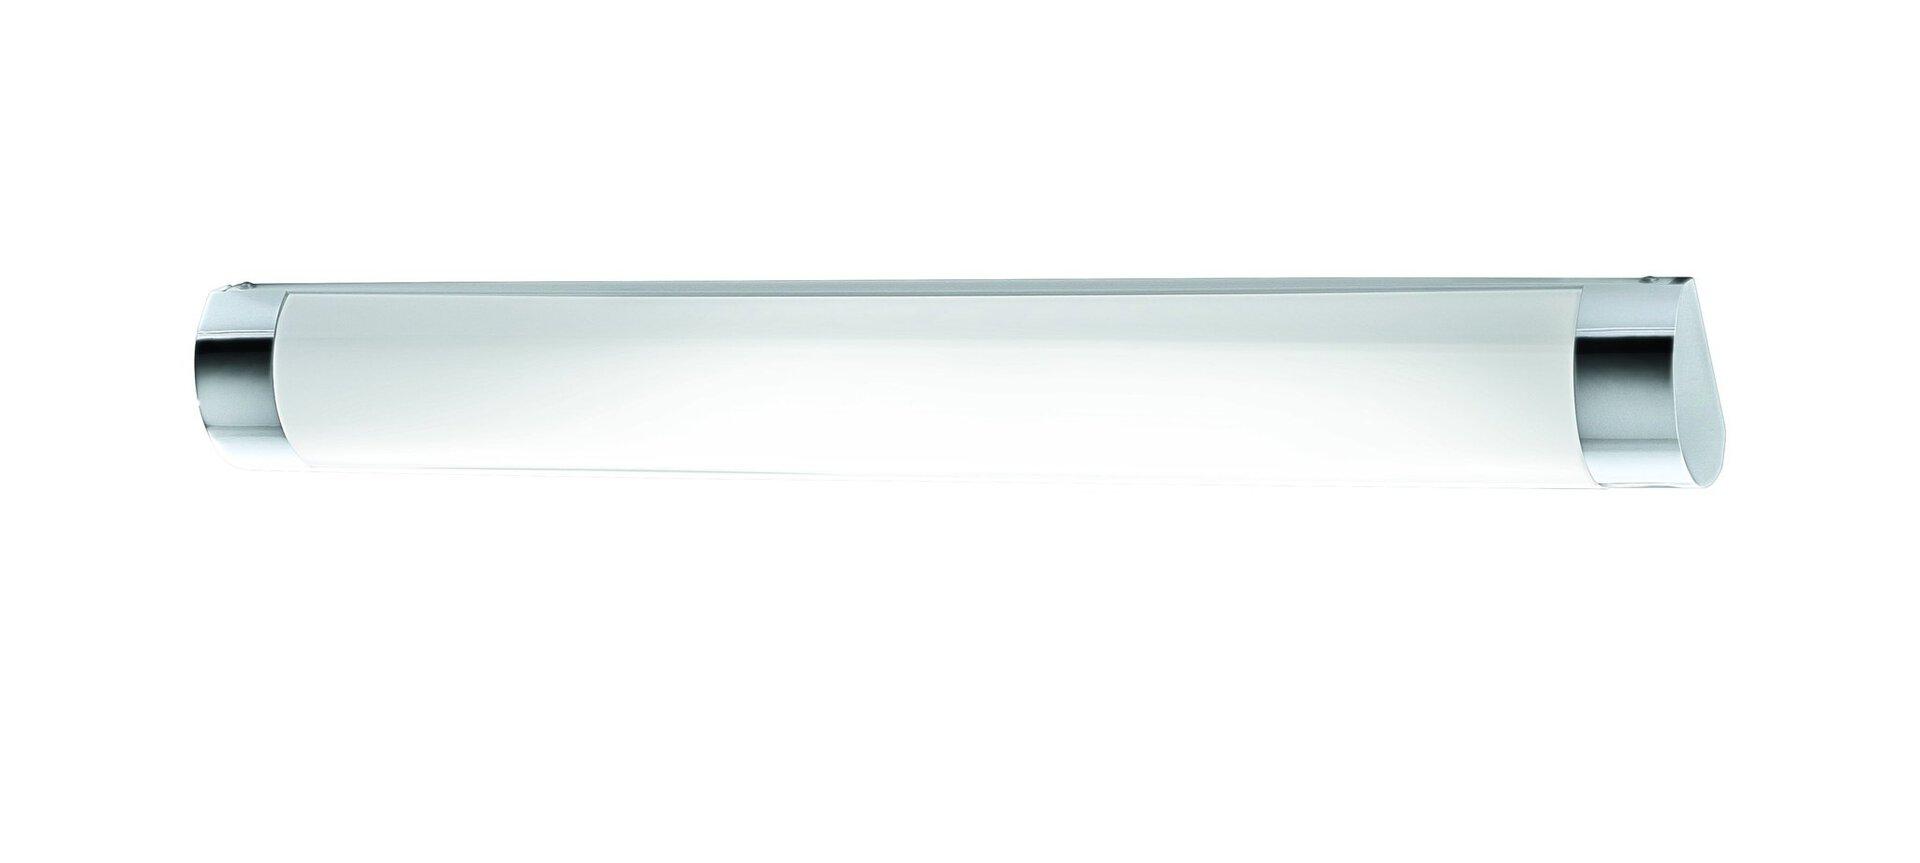 Bad-Wandleuchte Brilo Bath Briloner Metall 9 x 5 x 62 cm